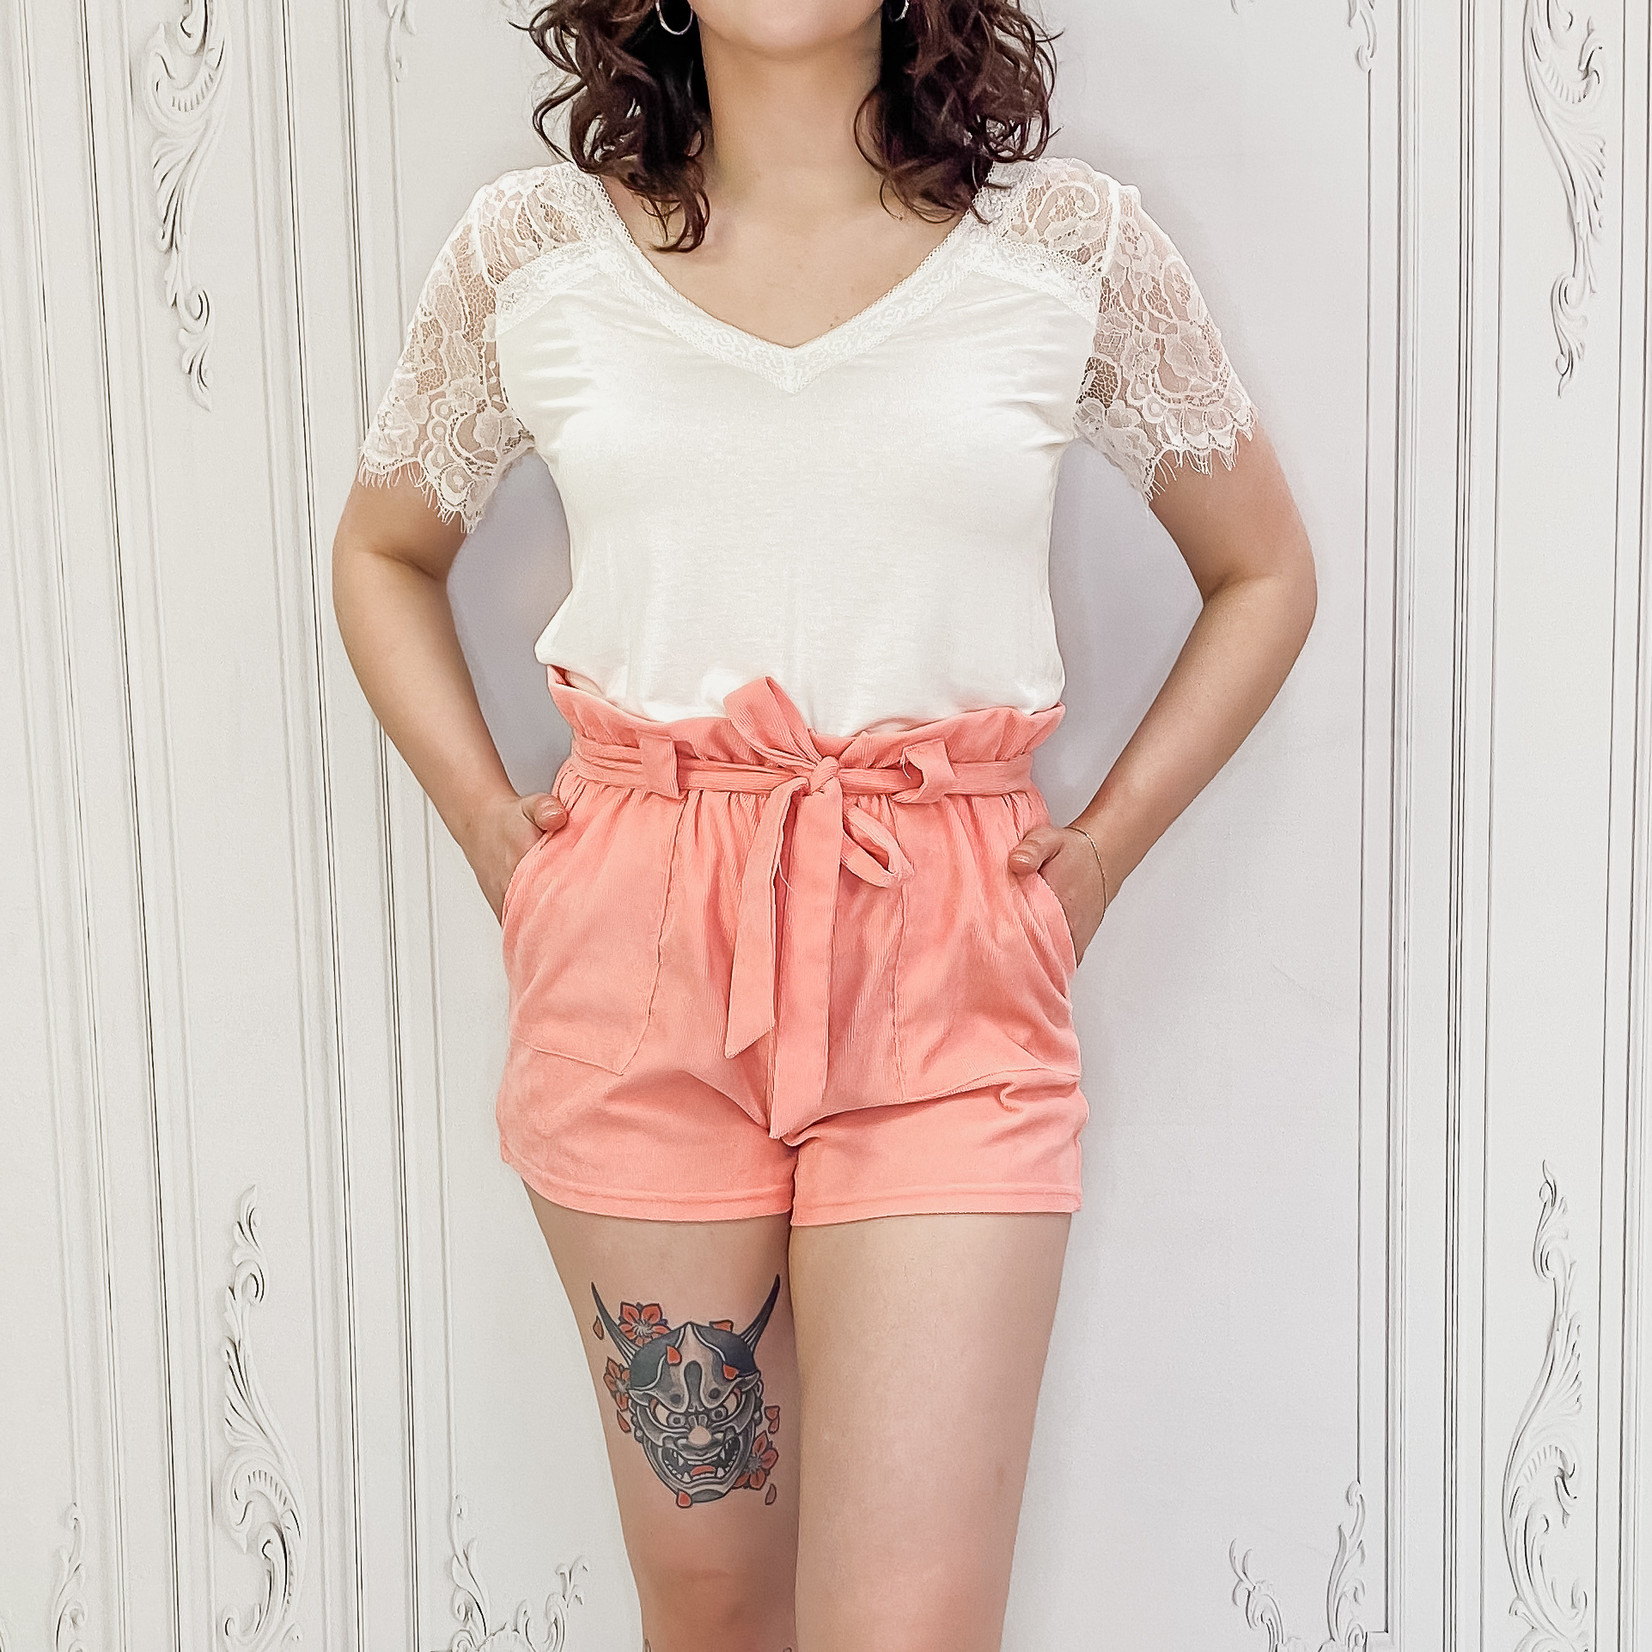 Sylvie lace sleeve top